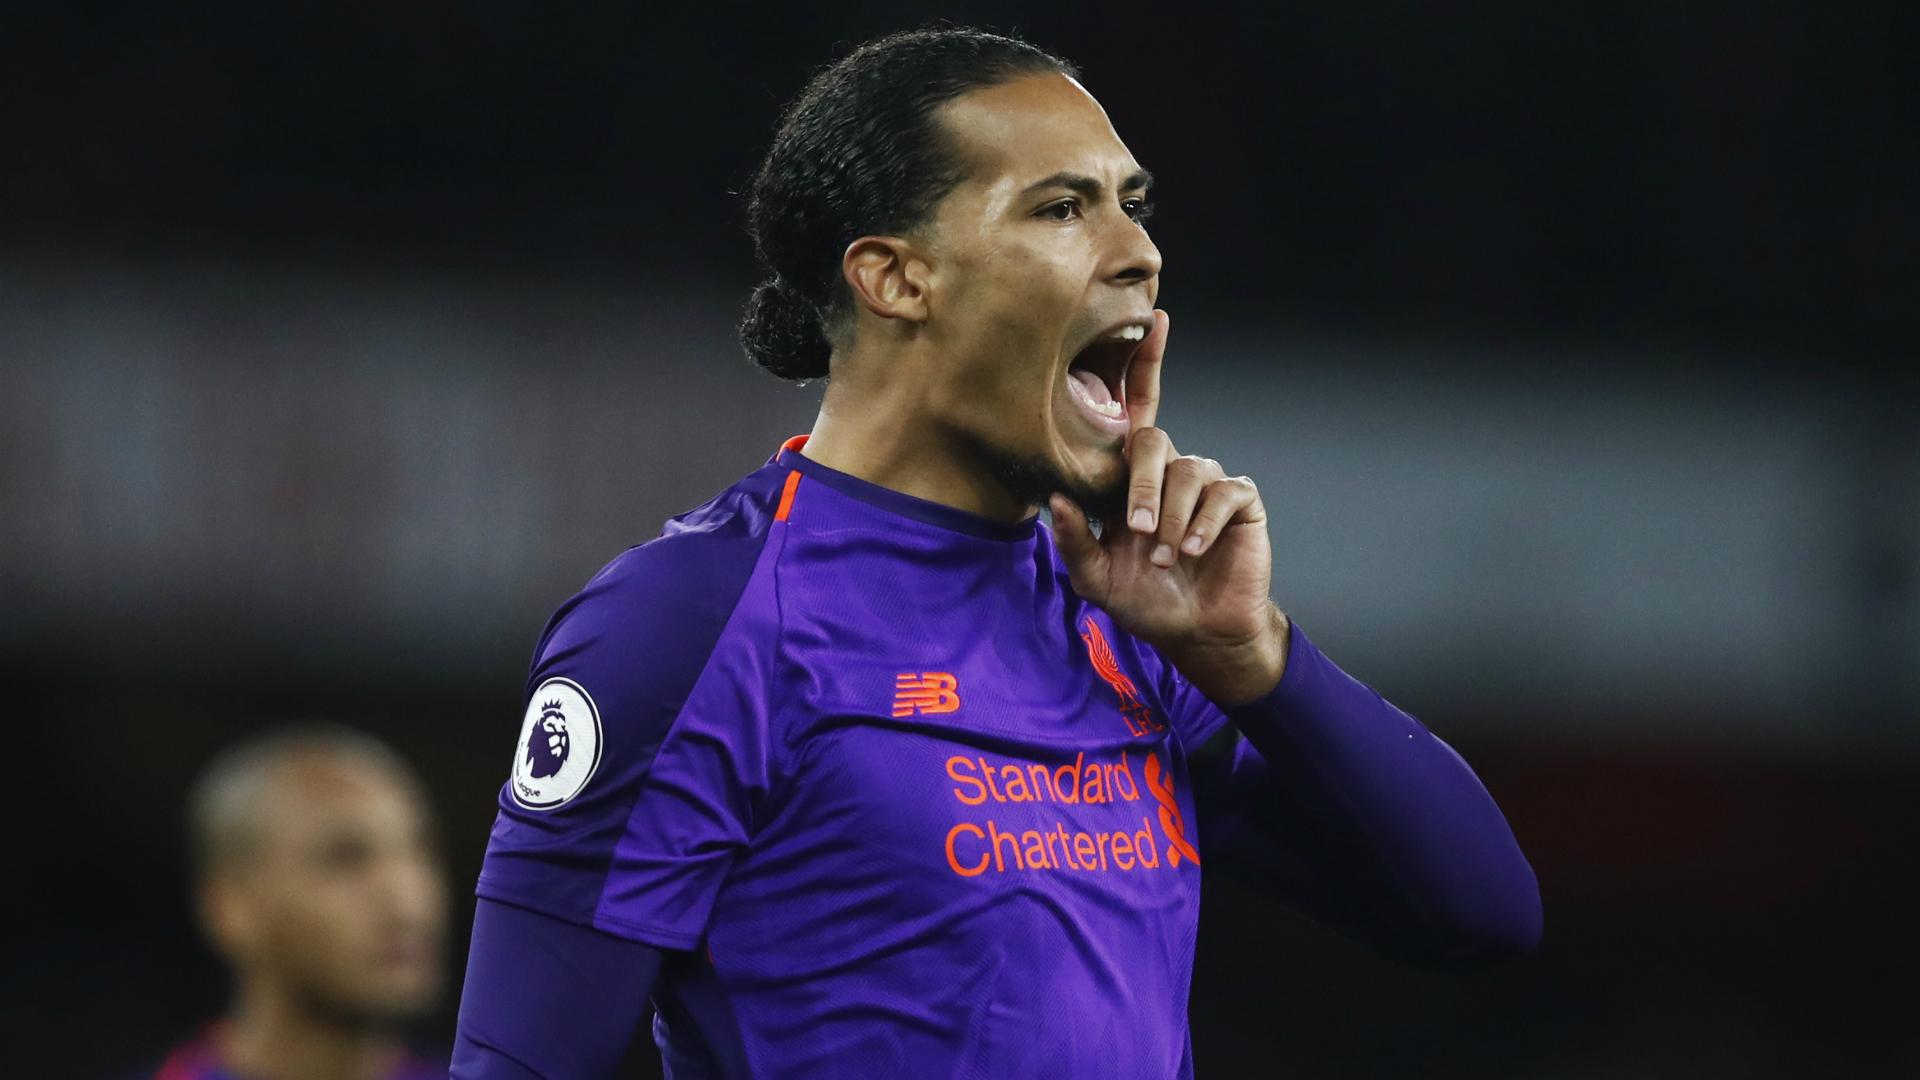 Manchester United need a Virgil van Dijk - Robson